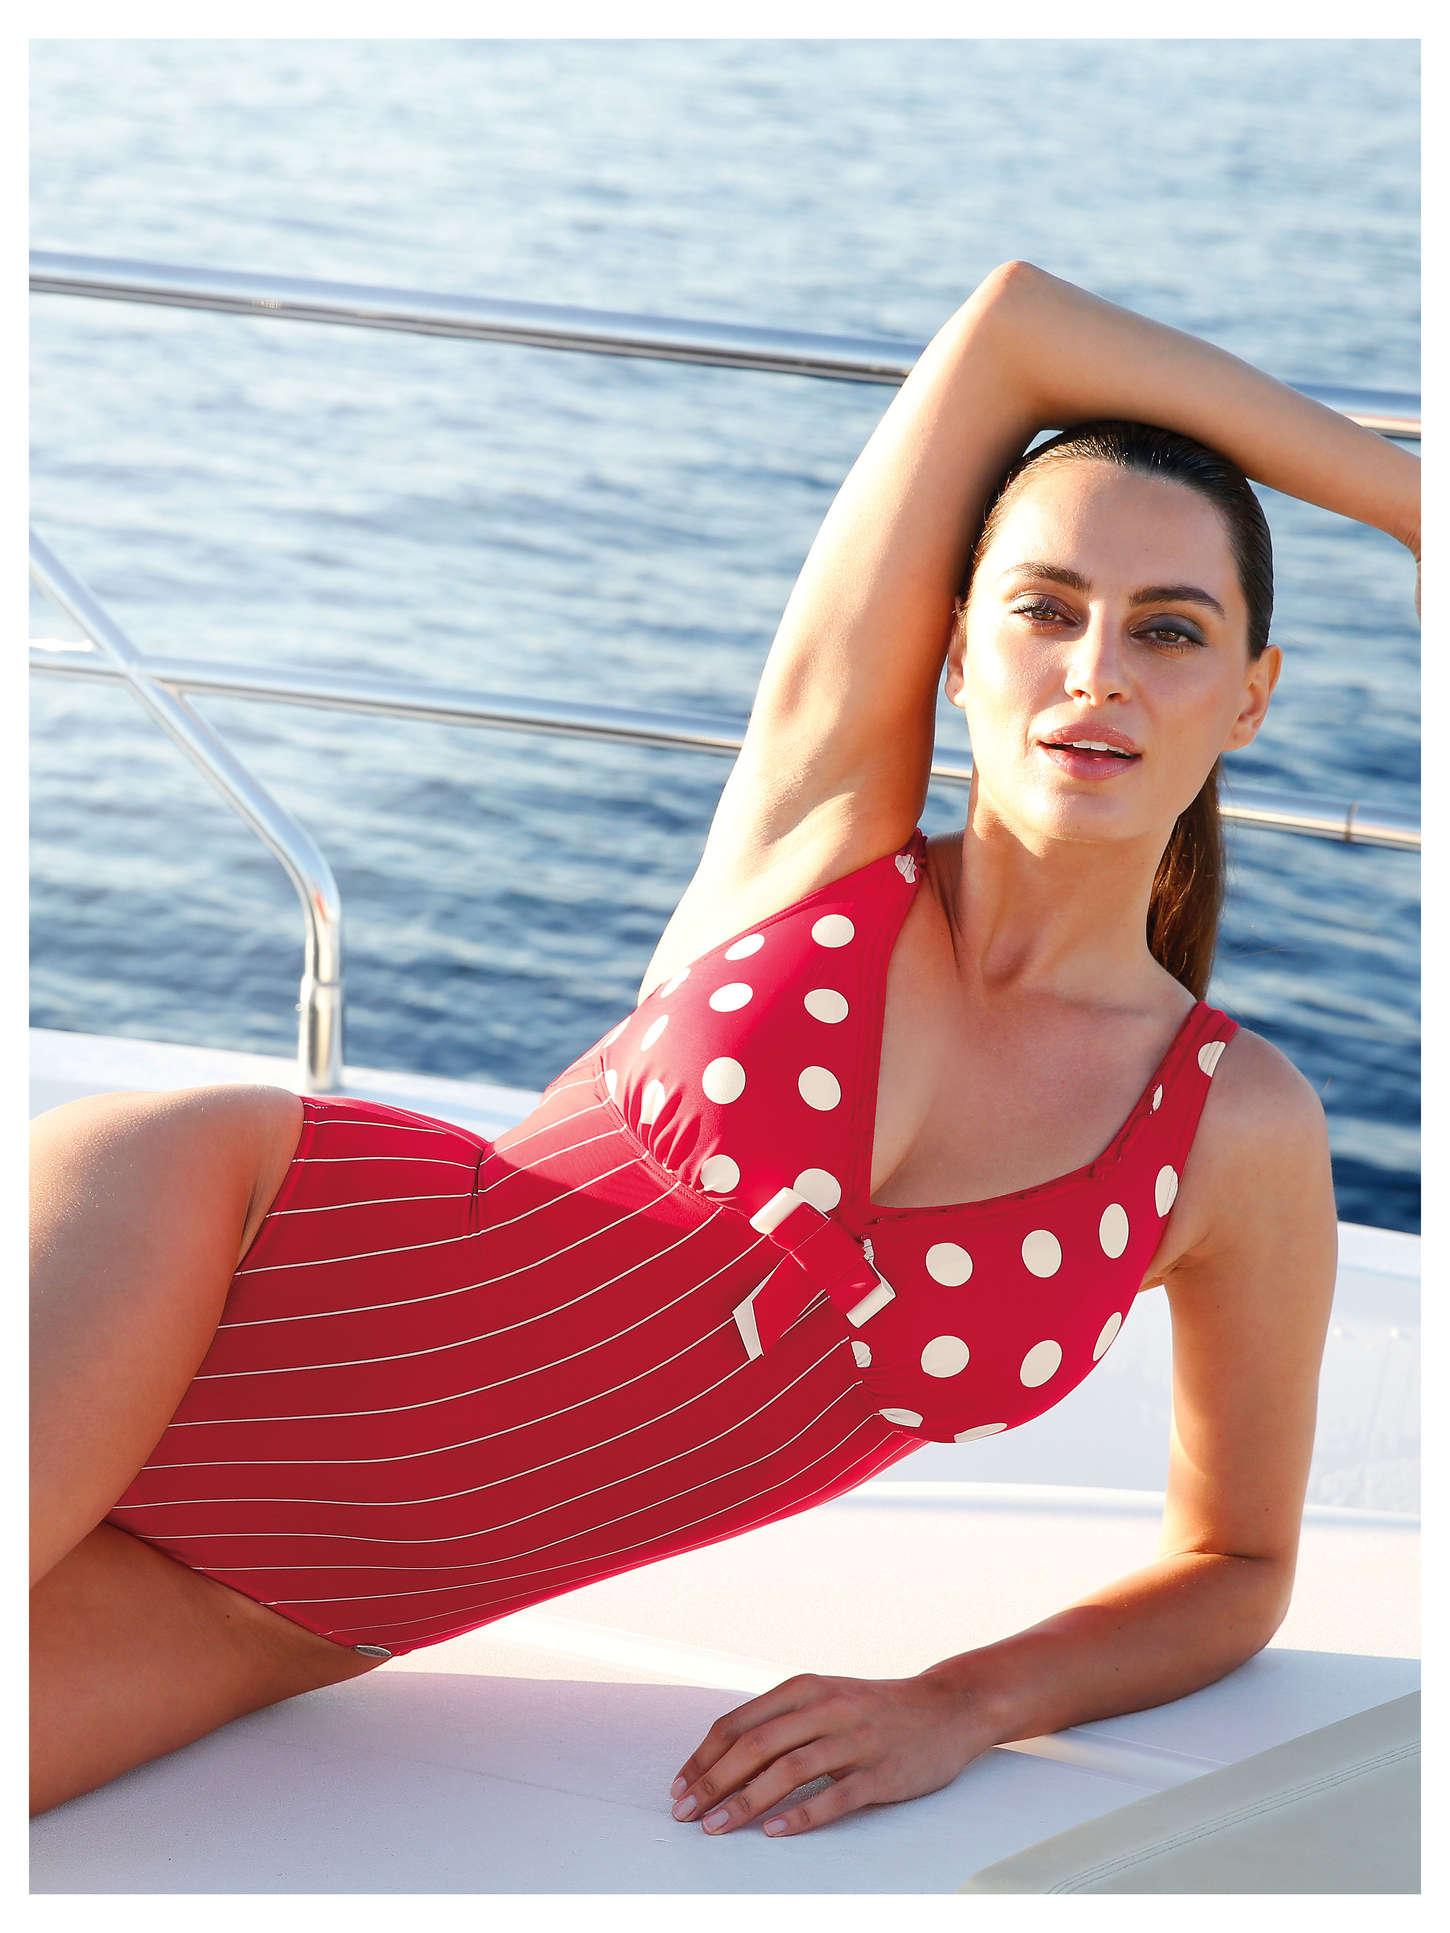 89cc8ae2b9 Catrinel Menghia  Sunflair Swimwear 2015 -16 – GotCeleb